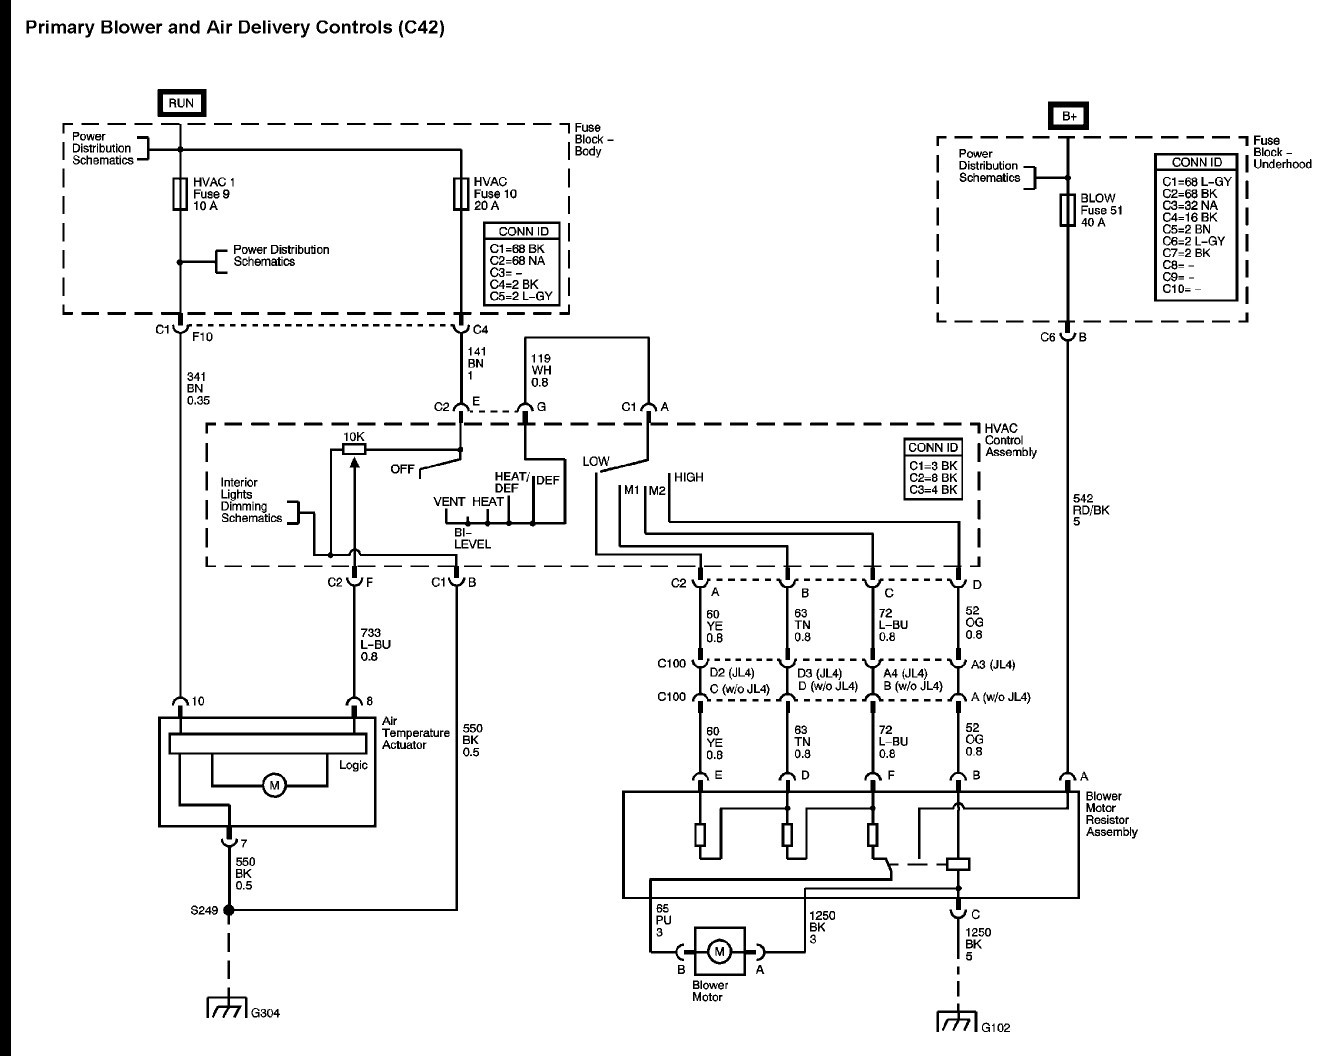 2005 express van wiring diagram schematic diagrams rh ogmconsulting co 2005 chevy silverado wiring diagrams 2005 chevy wiring diagrams